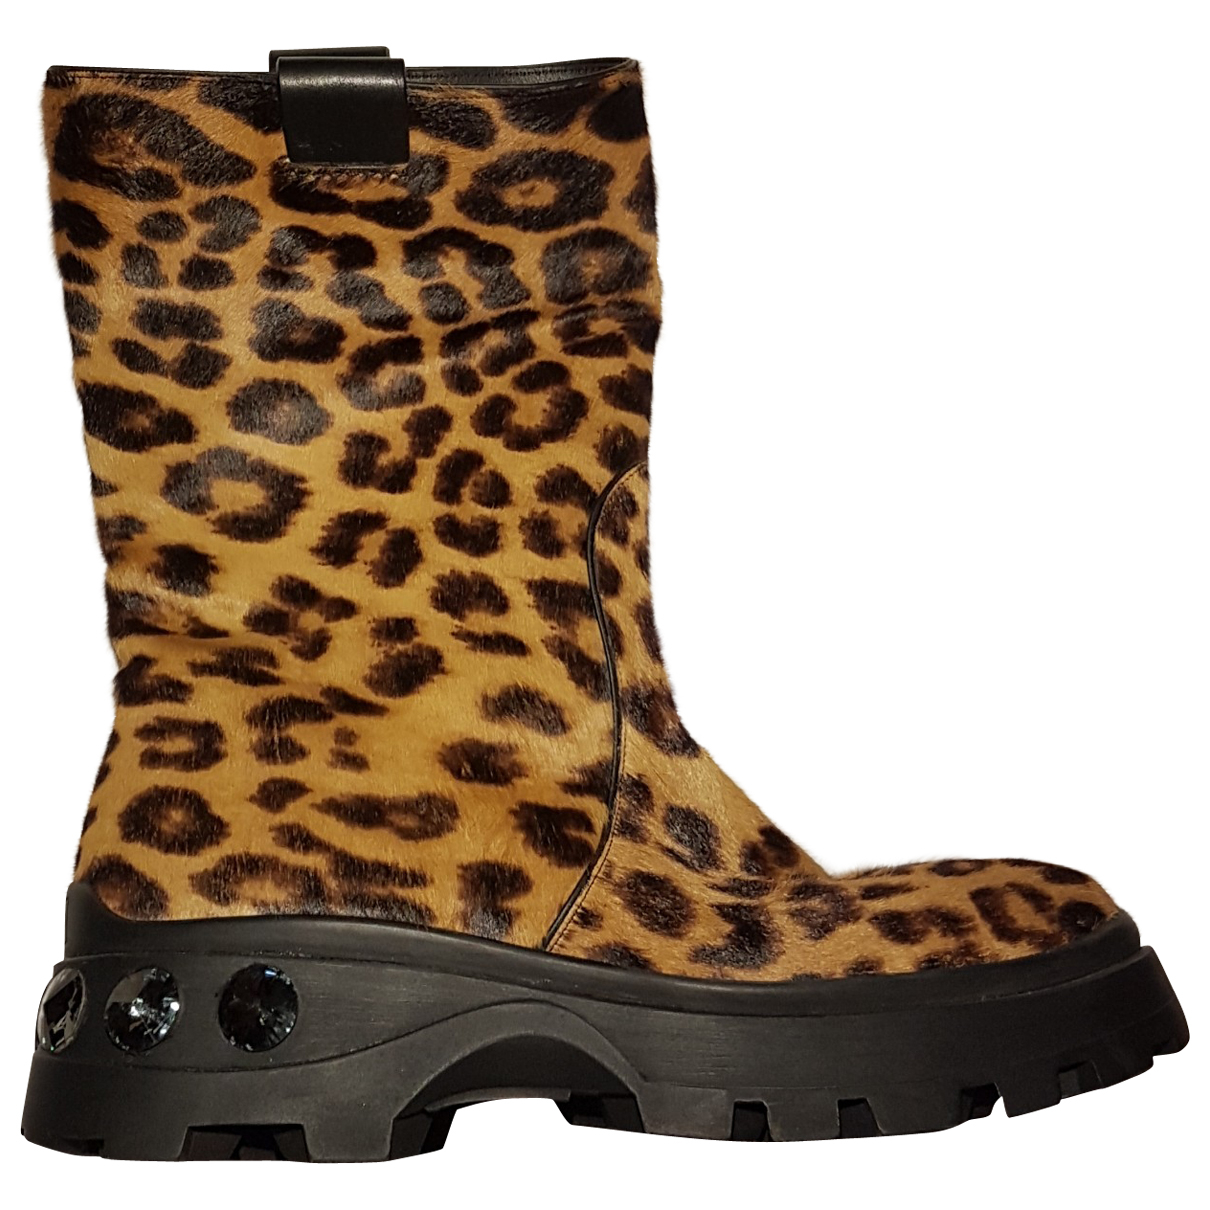 Miu Miu N Pony-style calfskin Ankle boots for Women 37 EU